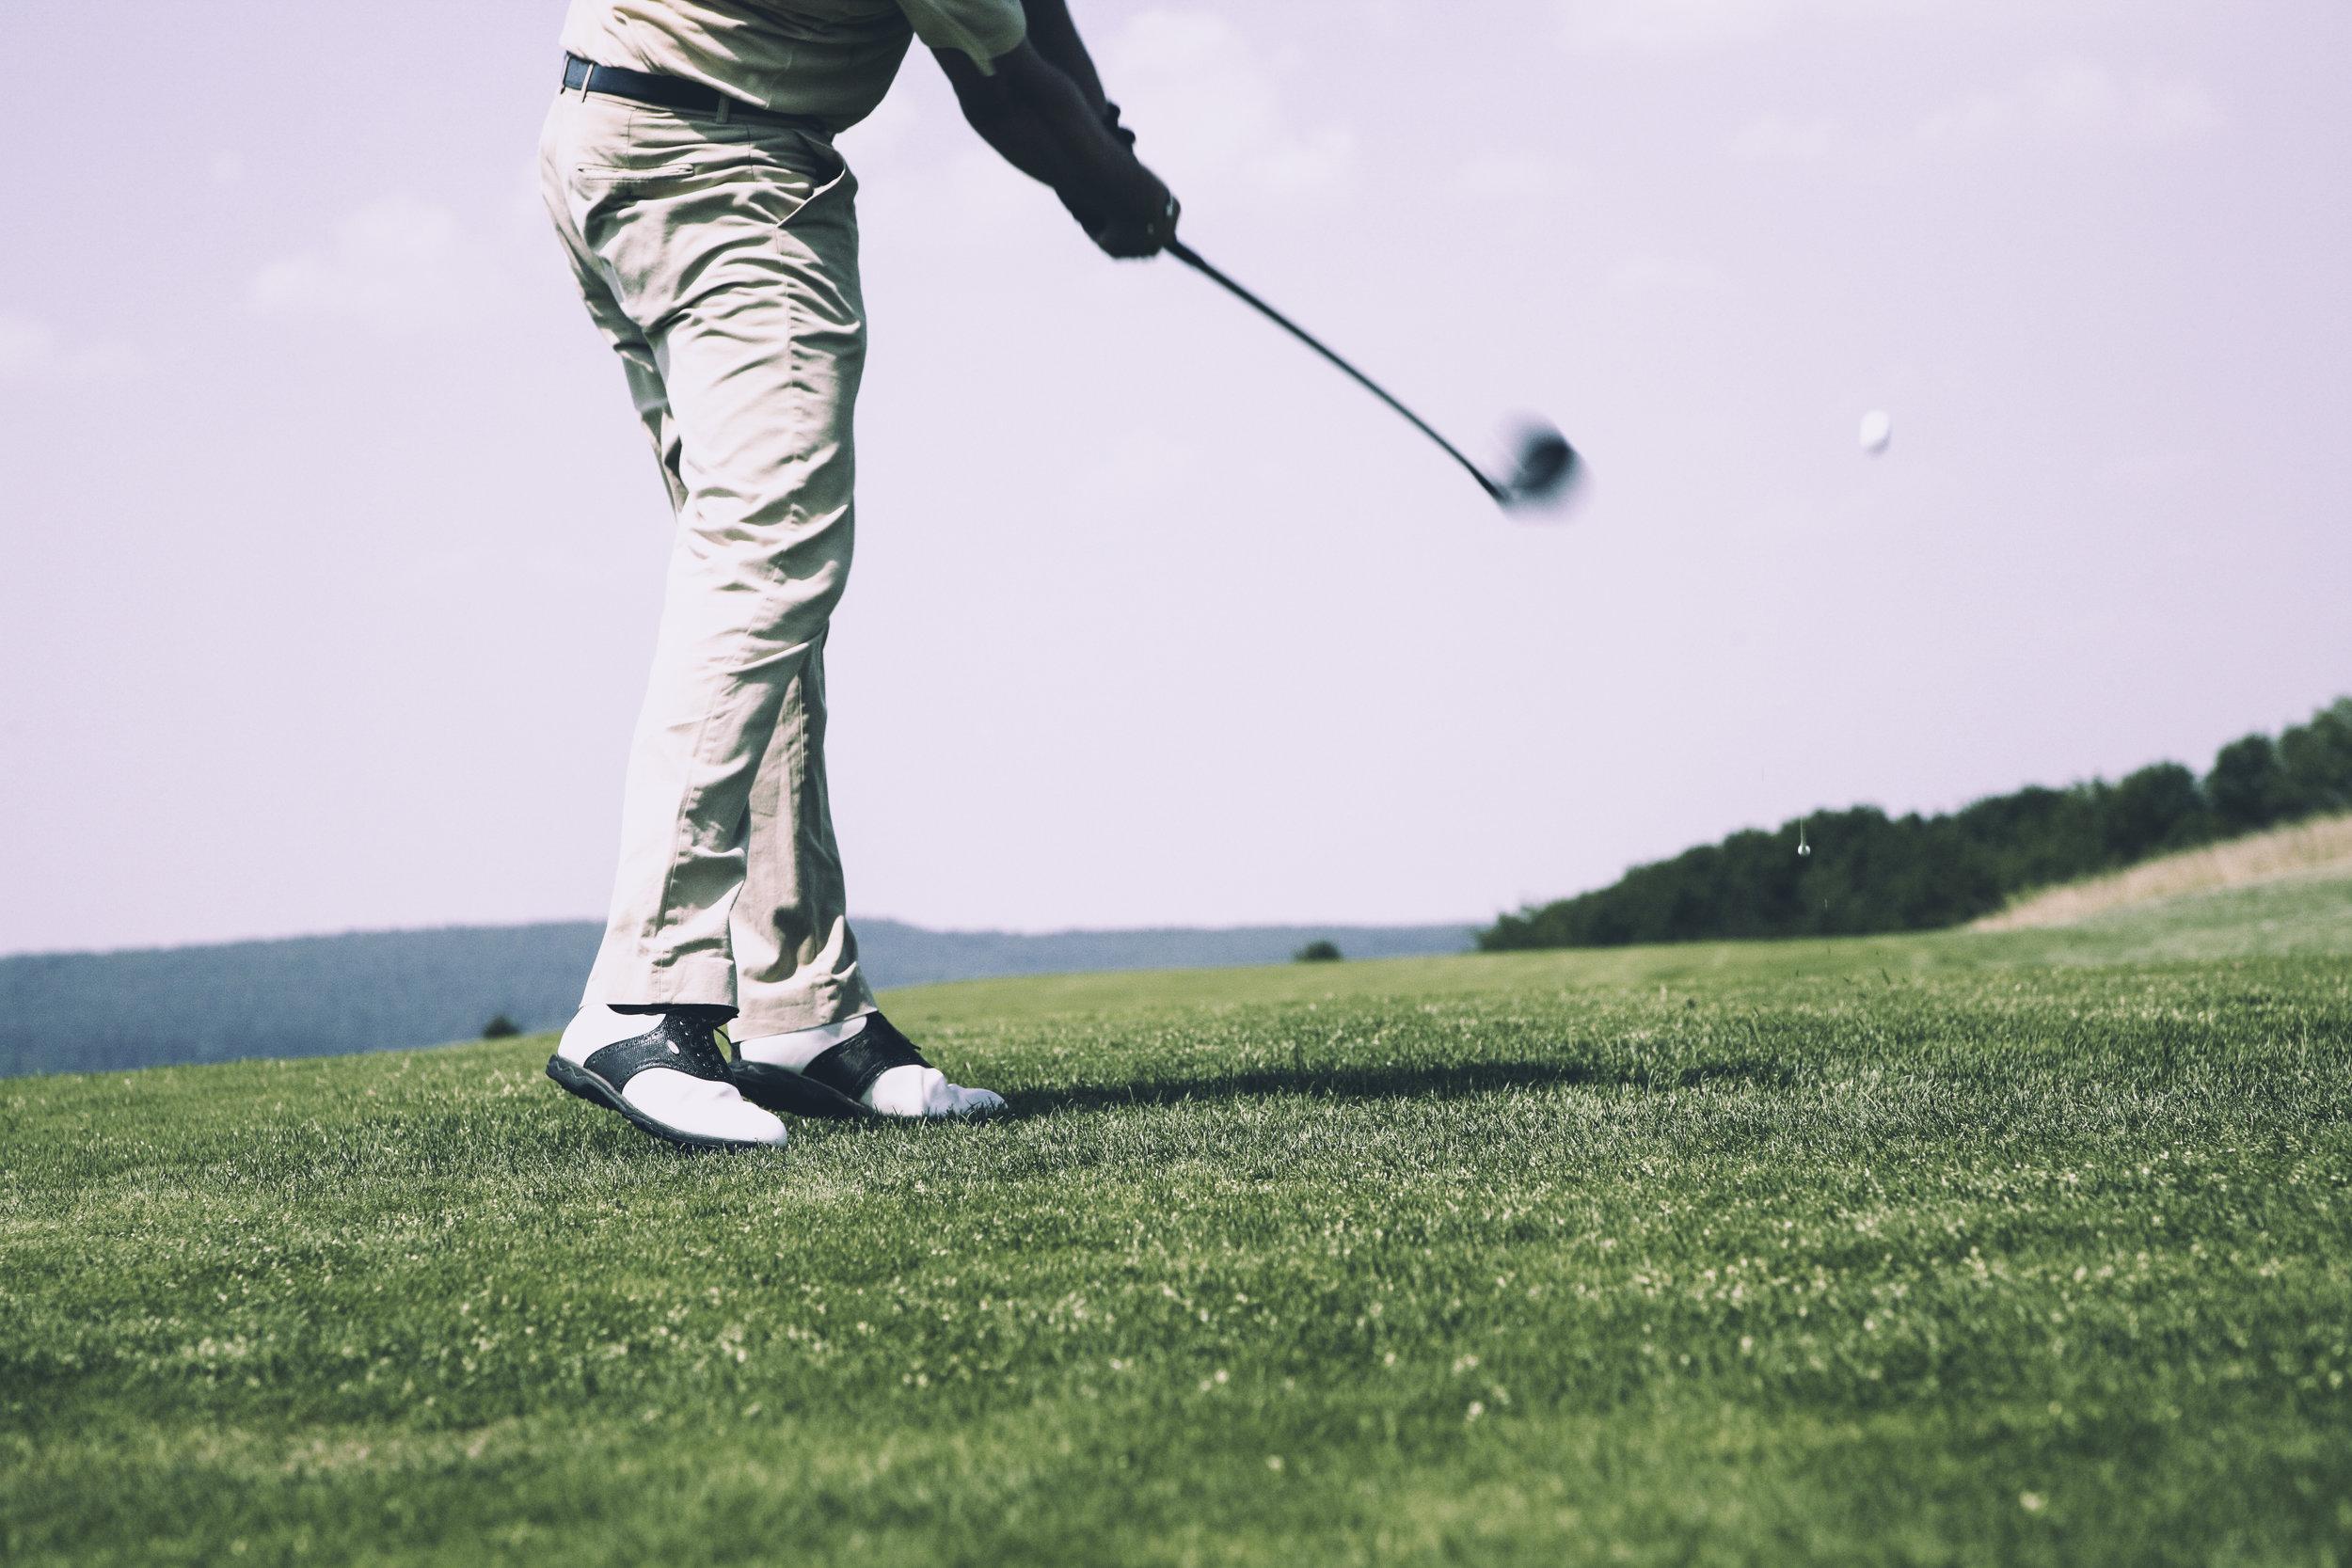 golfingpexels-photo-114972.jpeg